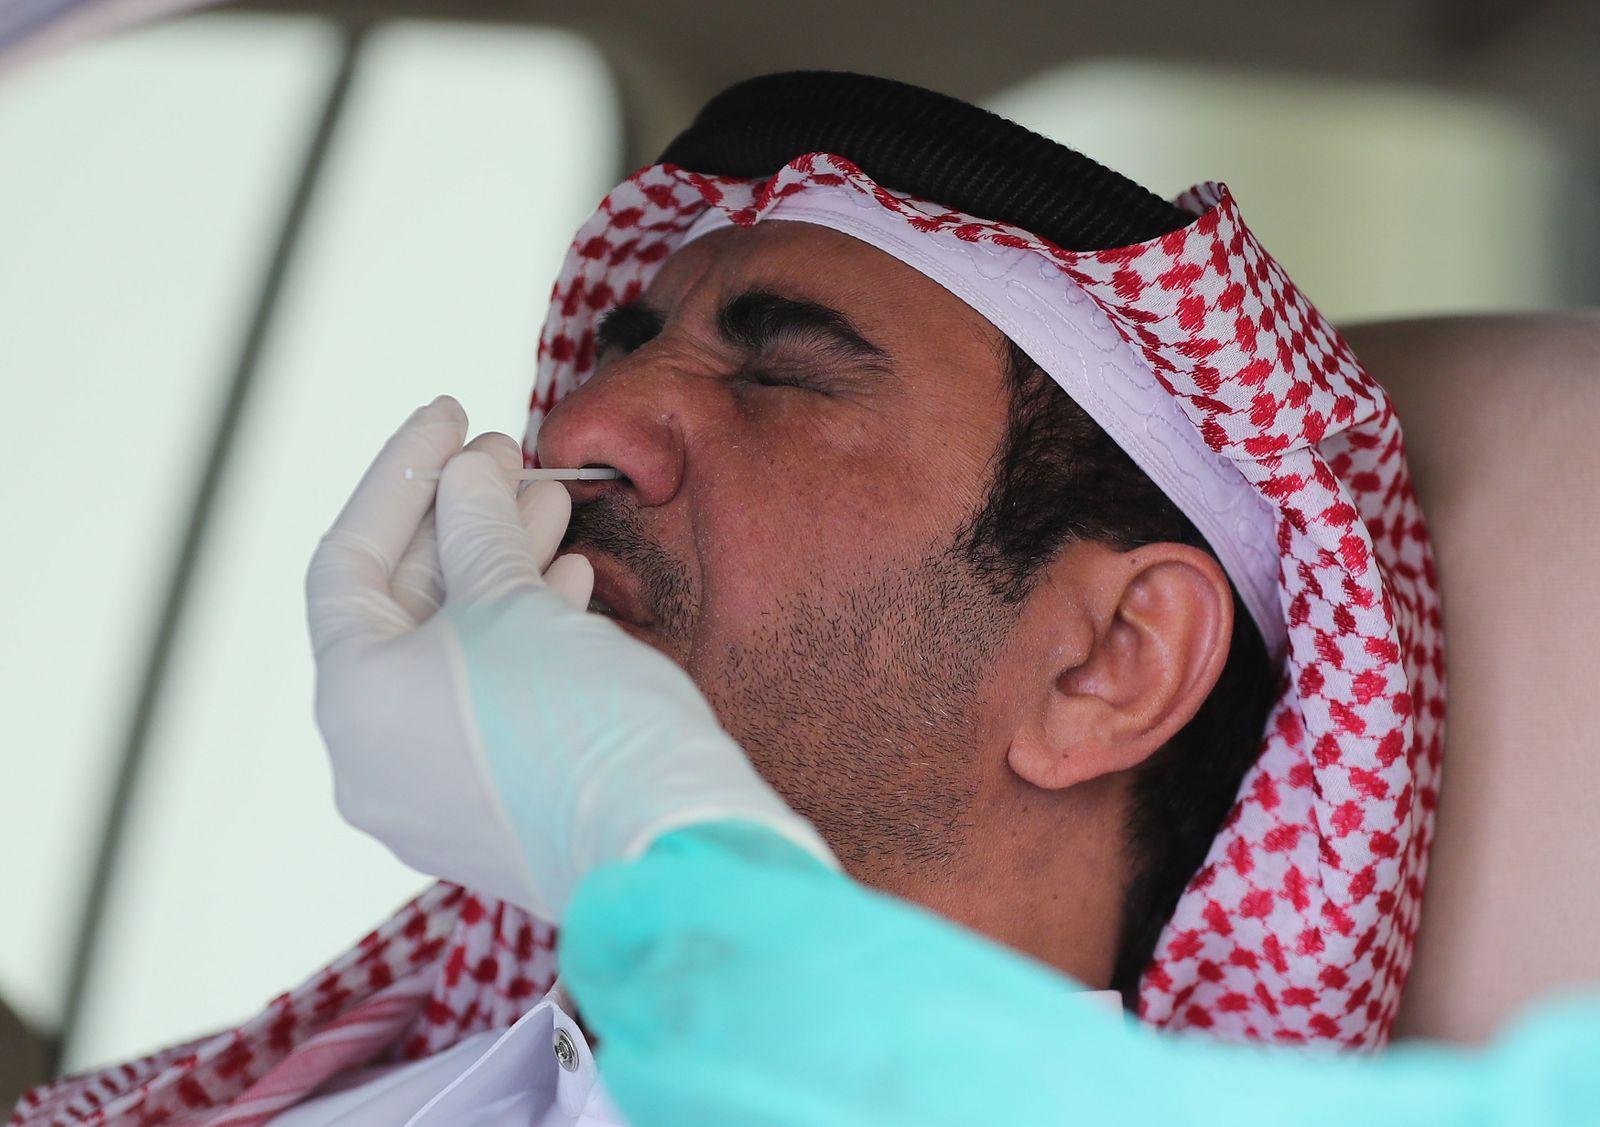 QATAR-HEALTH-VIRUS